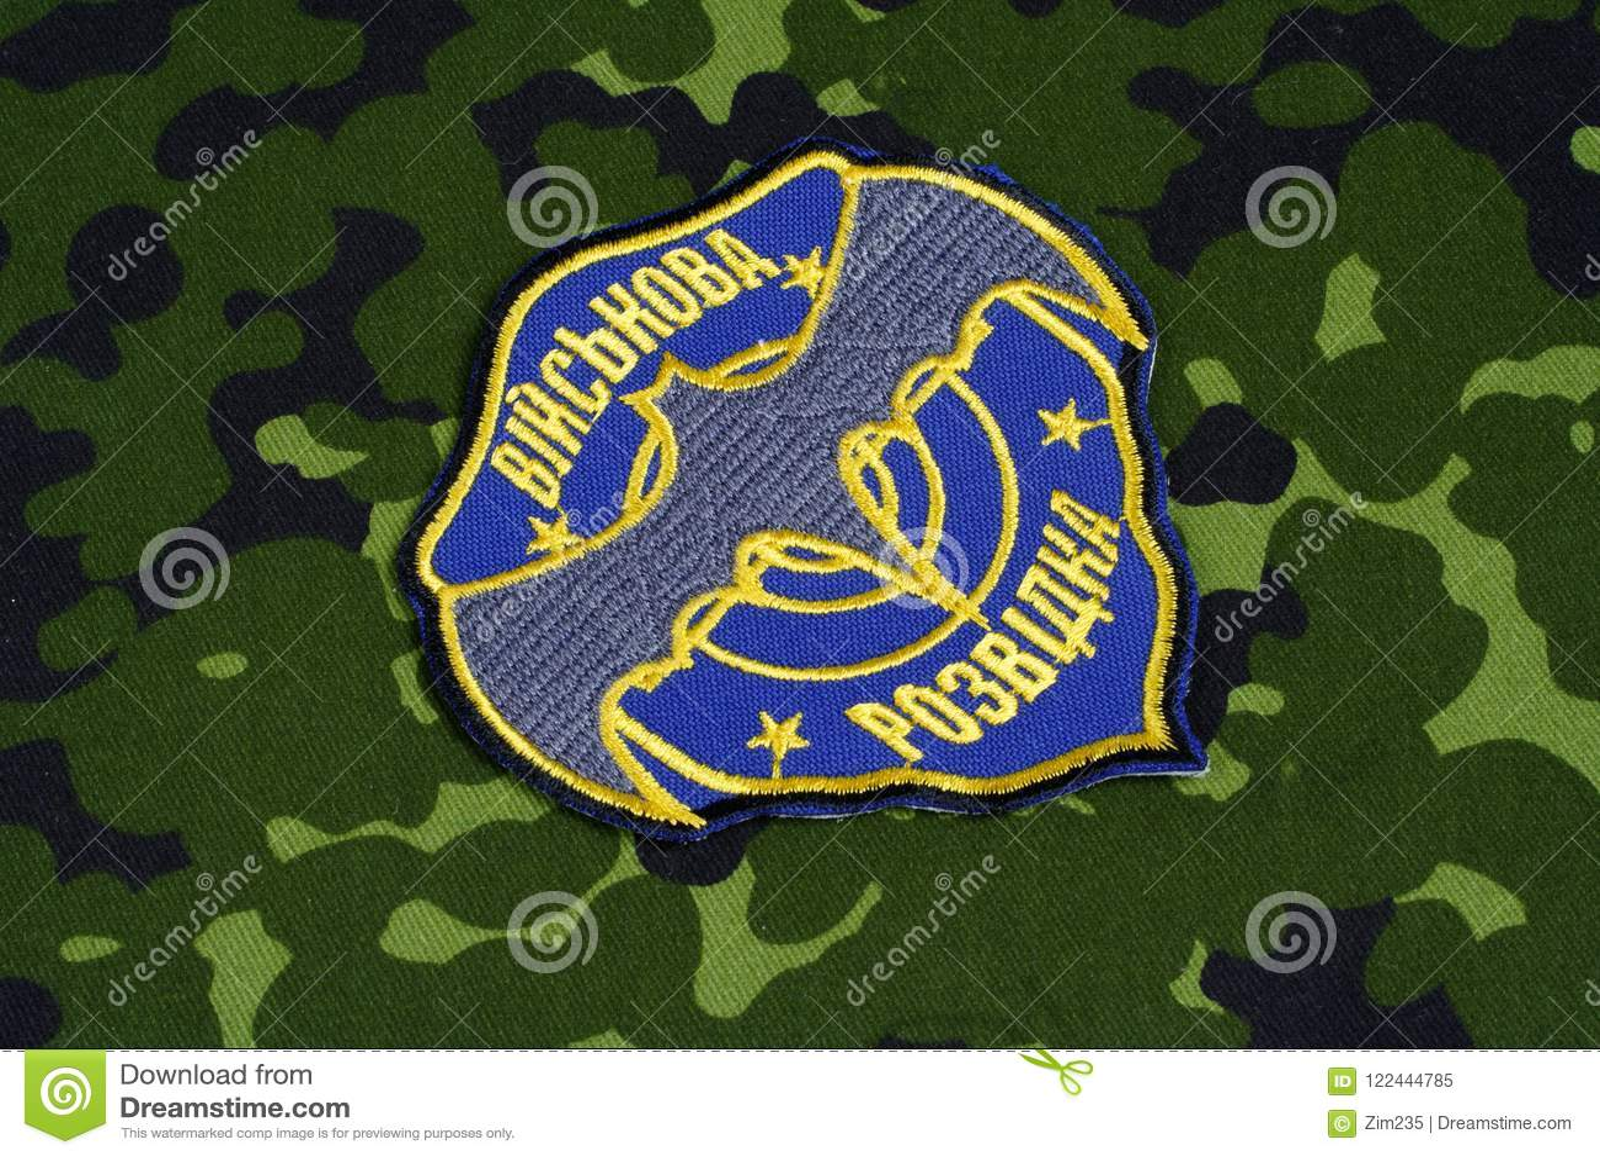 KYIV, ΟΥΚΡΑΝΊΑΣ - 16 Ιουλίου, 2015 Ομοιόμορφο διακριτικό στρατιωτικής νοημοσύνης της Ουκρανίας  «s